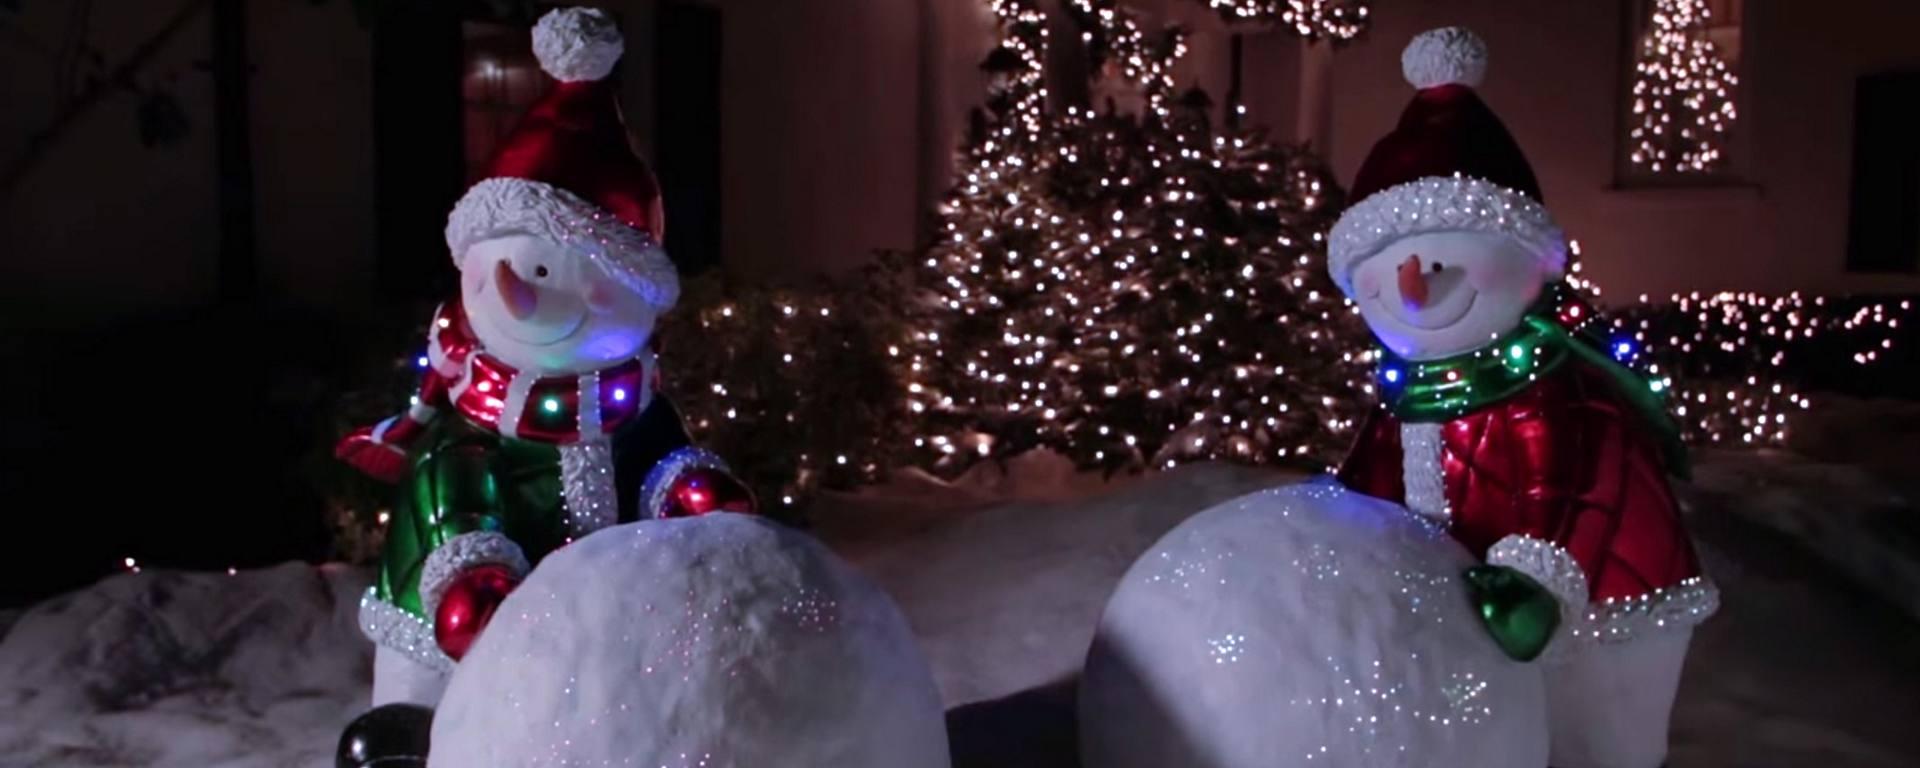 Fiber optic christmas snowman wreath decoration - Fiber Optic Christmas Snowman Wreath Decoration